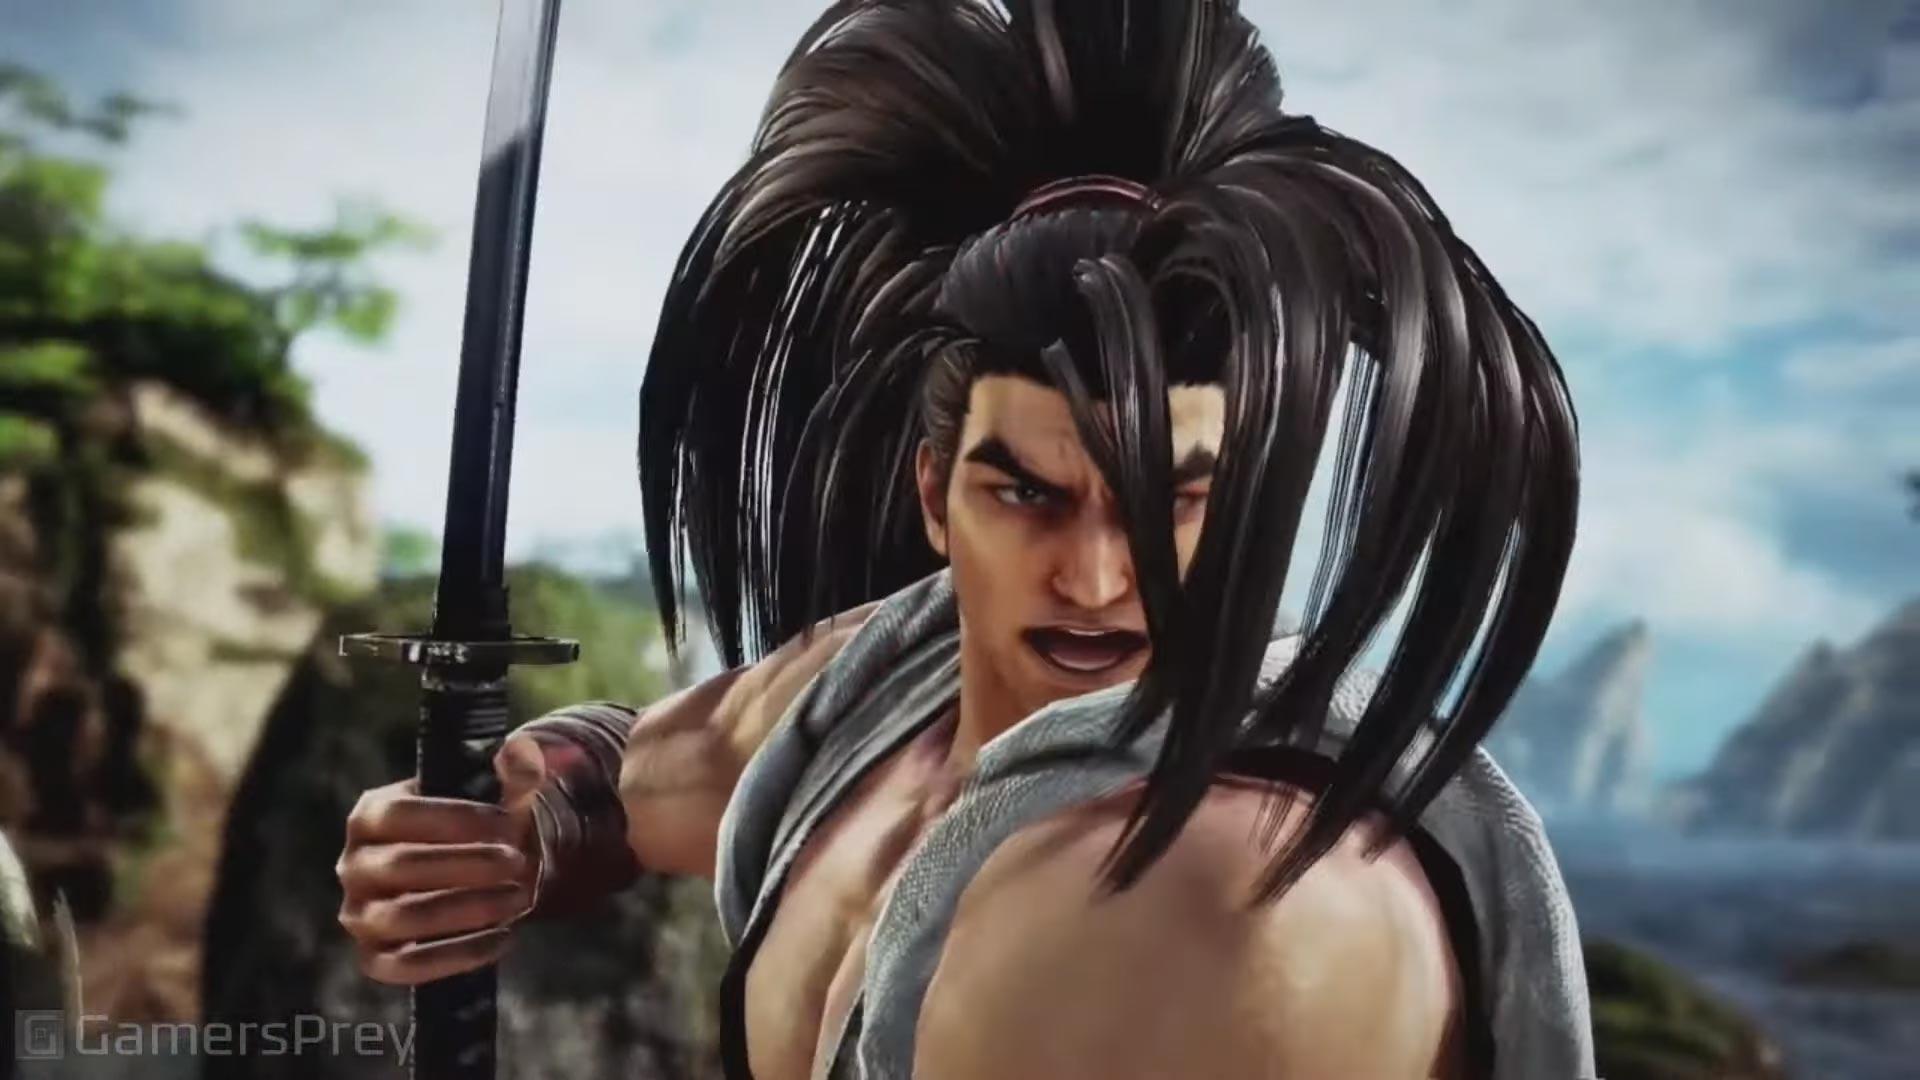 Soul Calibur 6 Haohmaru Trailer Screenshot Gallery 5 out of 6 image gallery